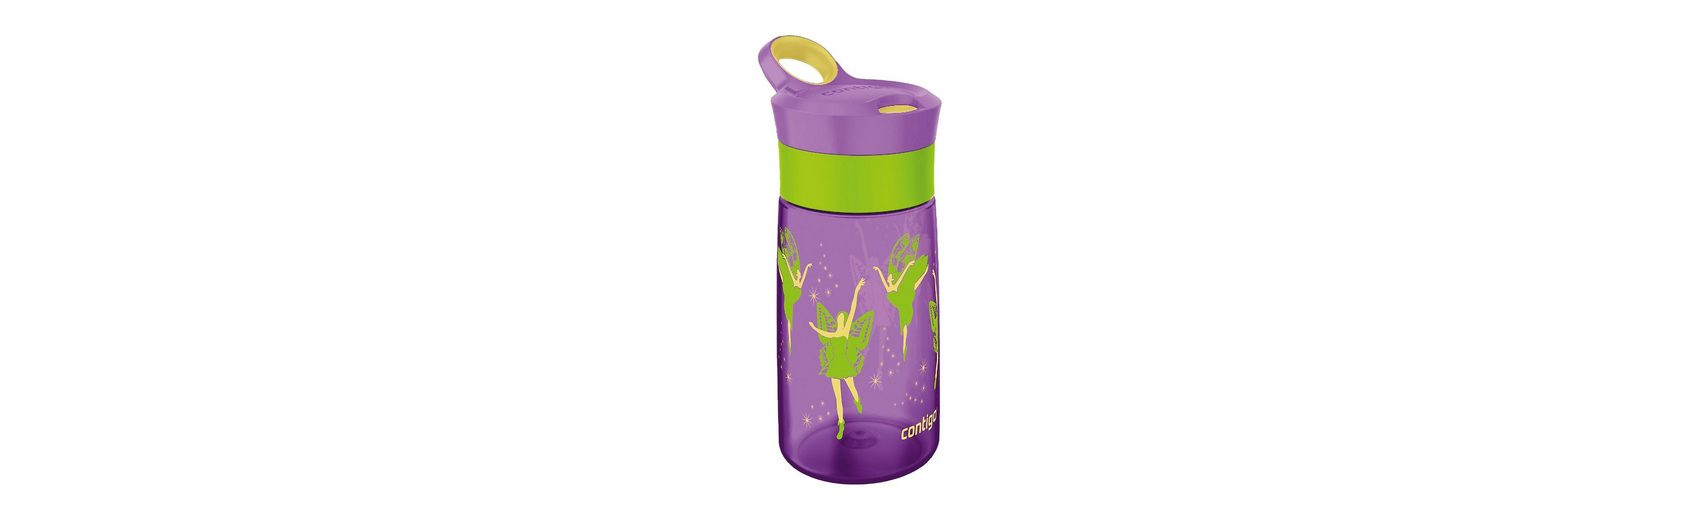 contigo Trinkflasche Gracie purple Fairies, 420 ml